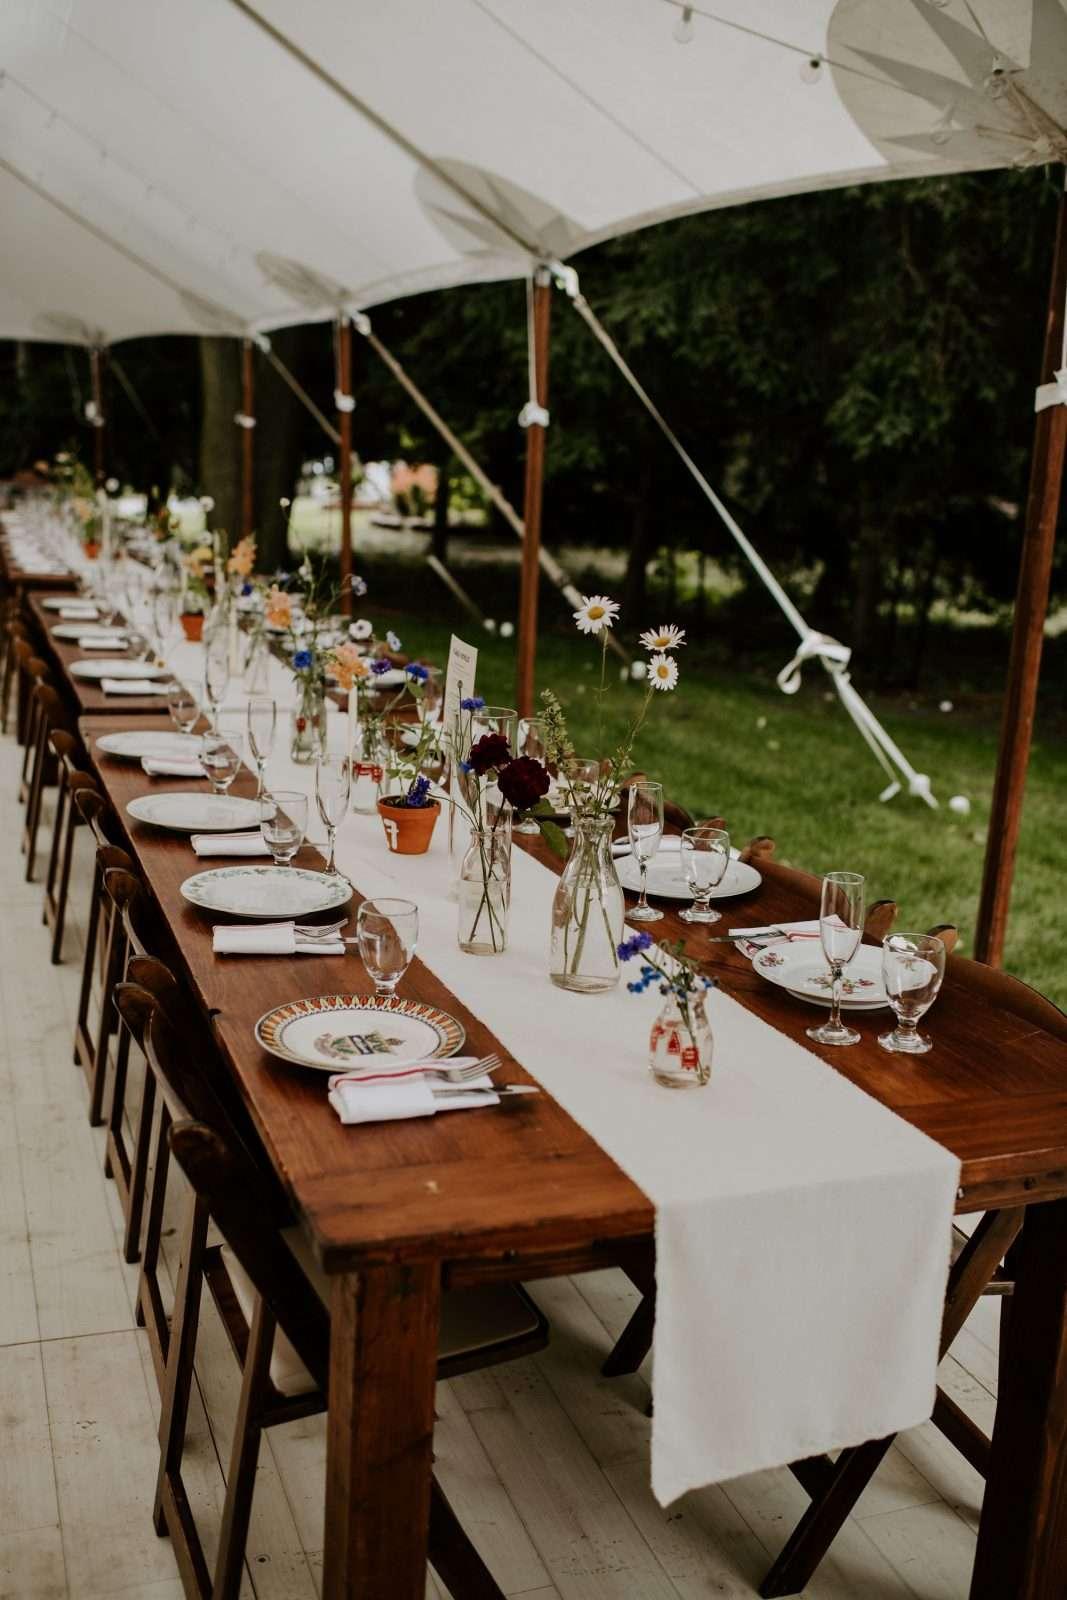 Sailcloth Farm Tables Bistro Lighting Mccarthy Tents